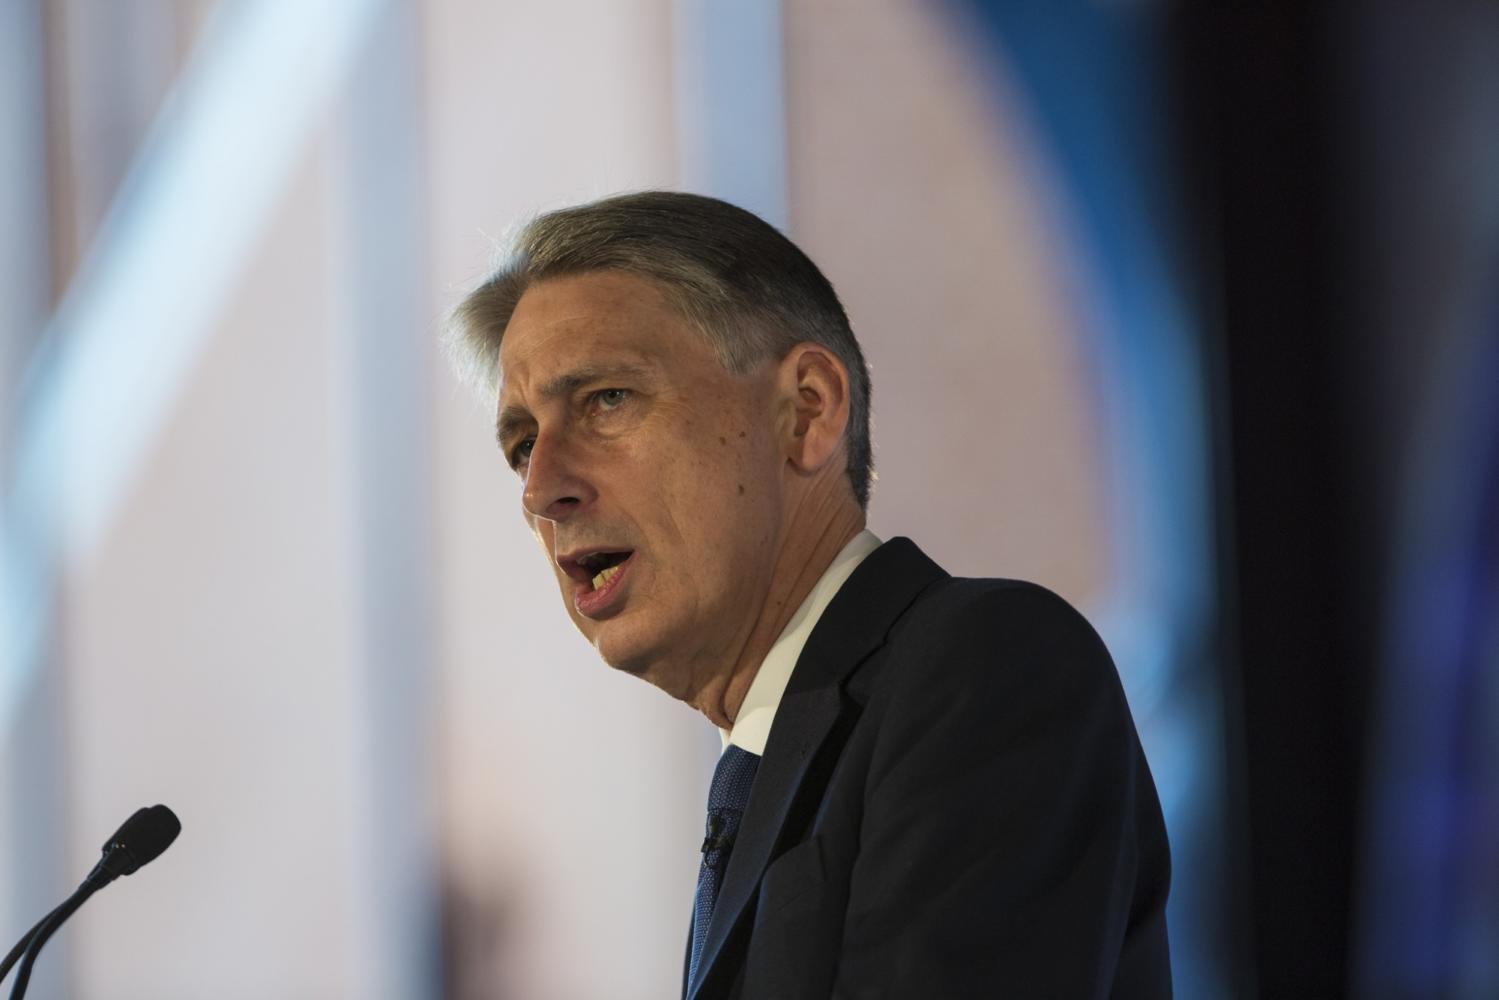 UK Chancellor Philip Hammond